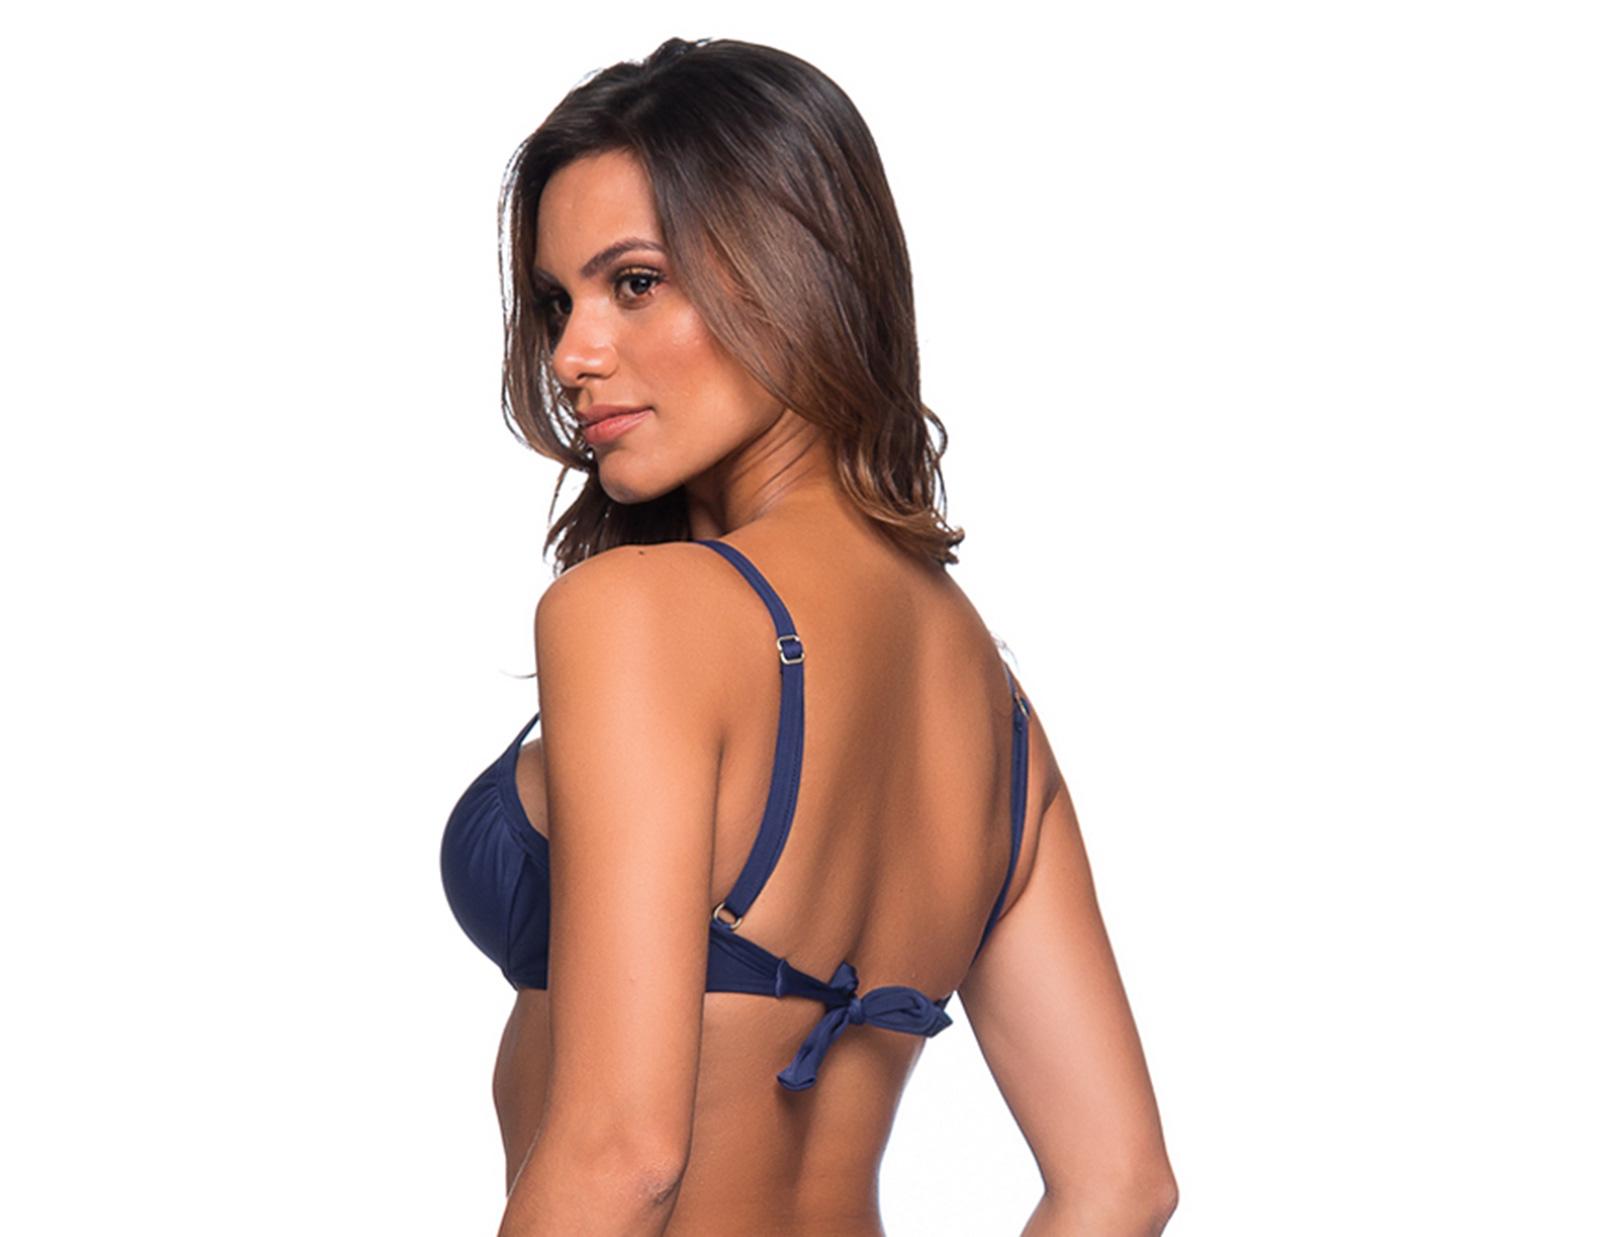 85c1ca1f44b65 Bikini-Tops Marineblauwe Balconettetop Met Beugel - Top No Miramar